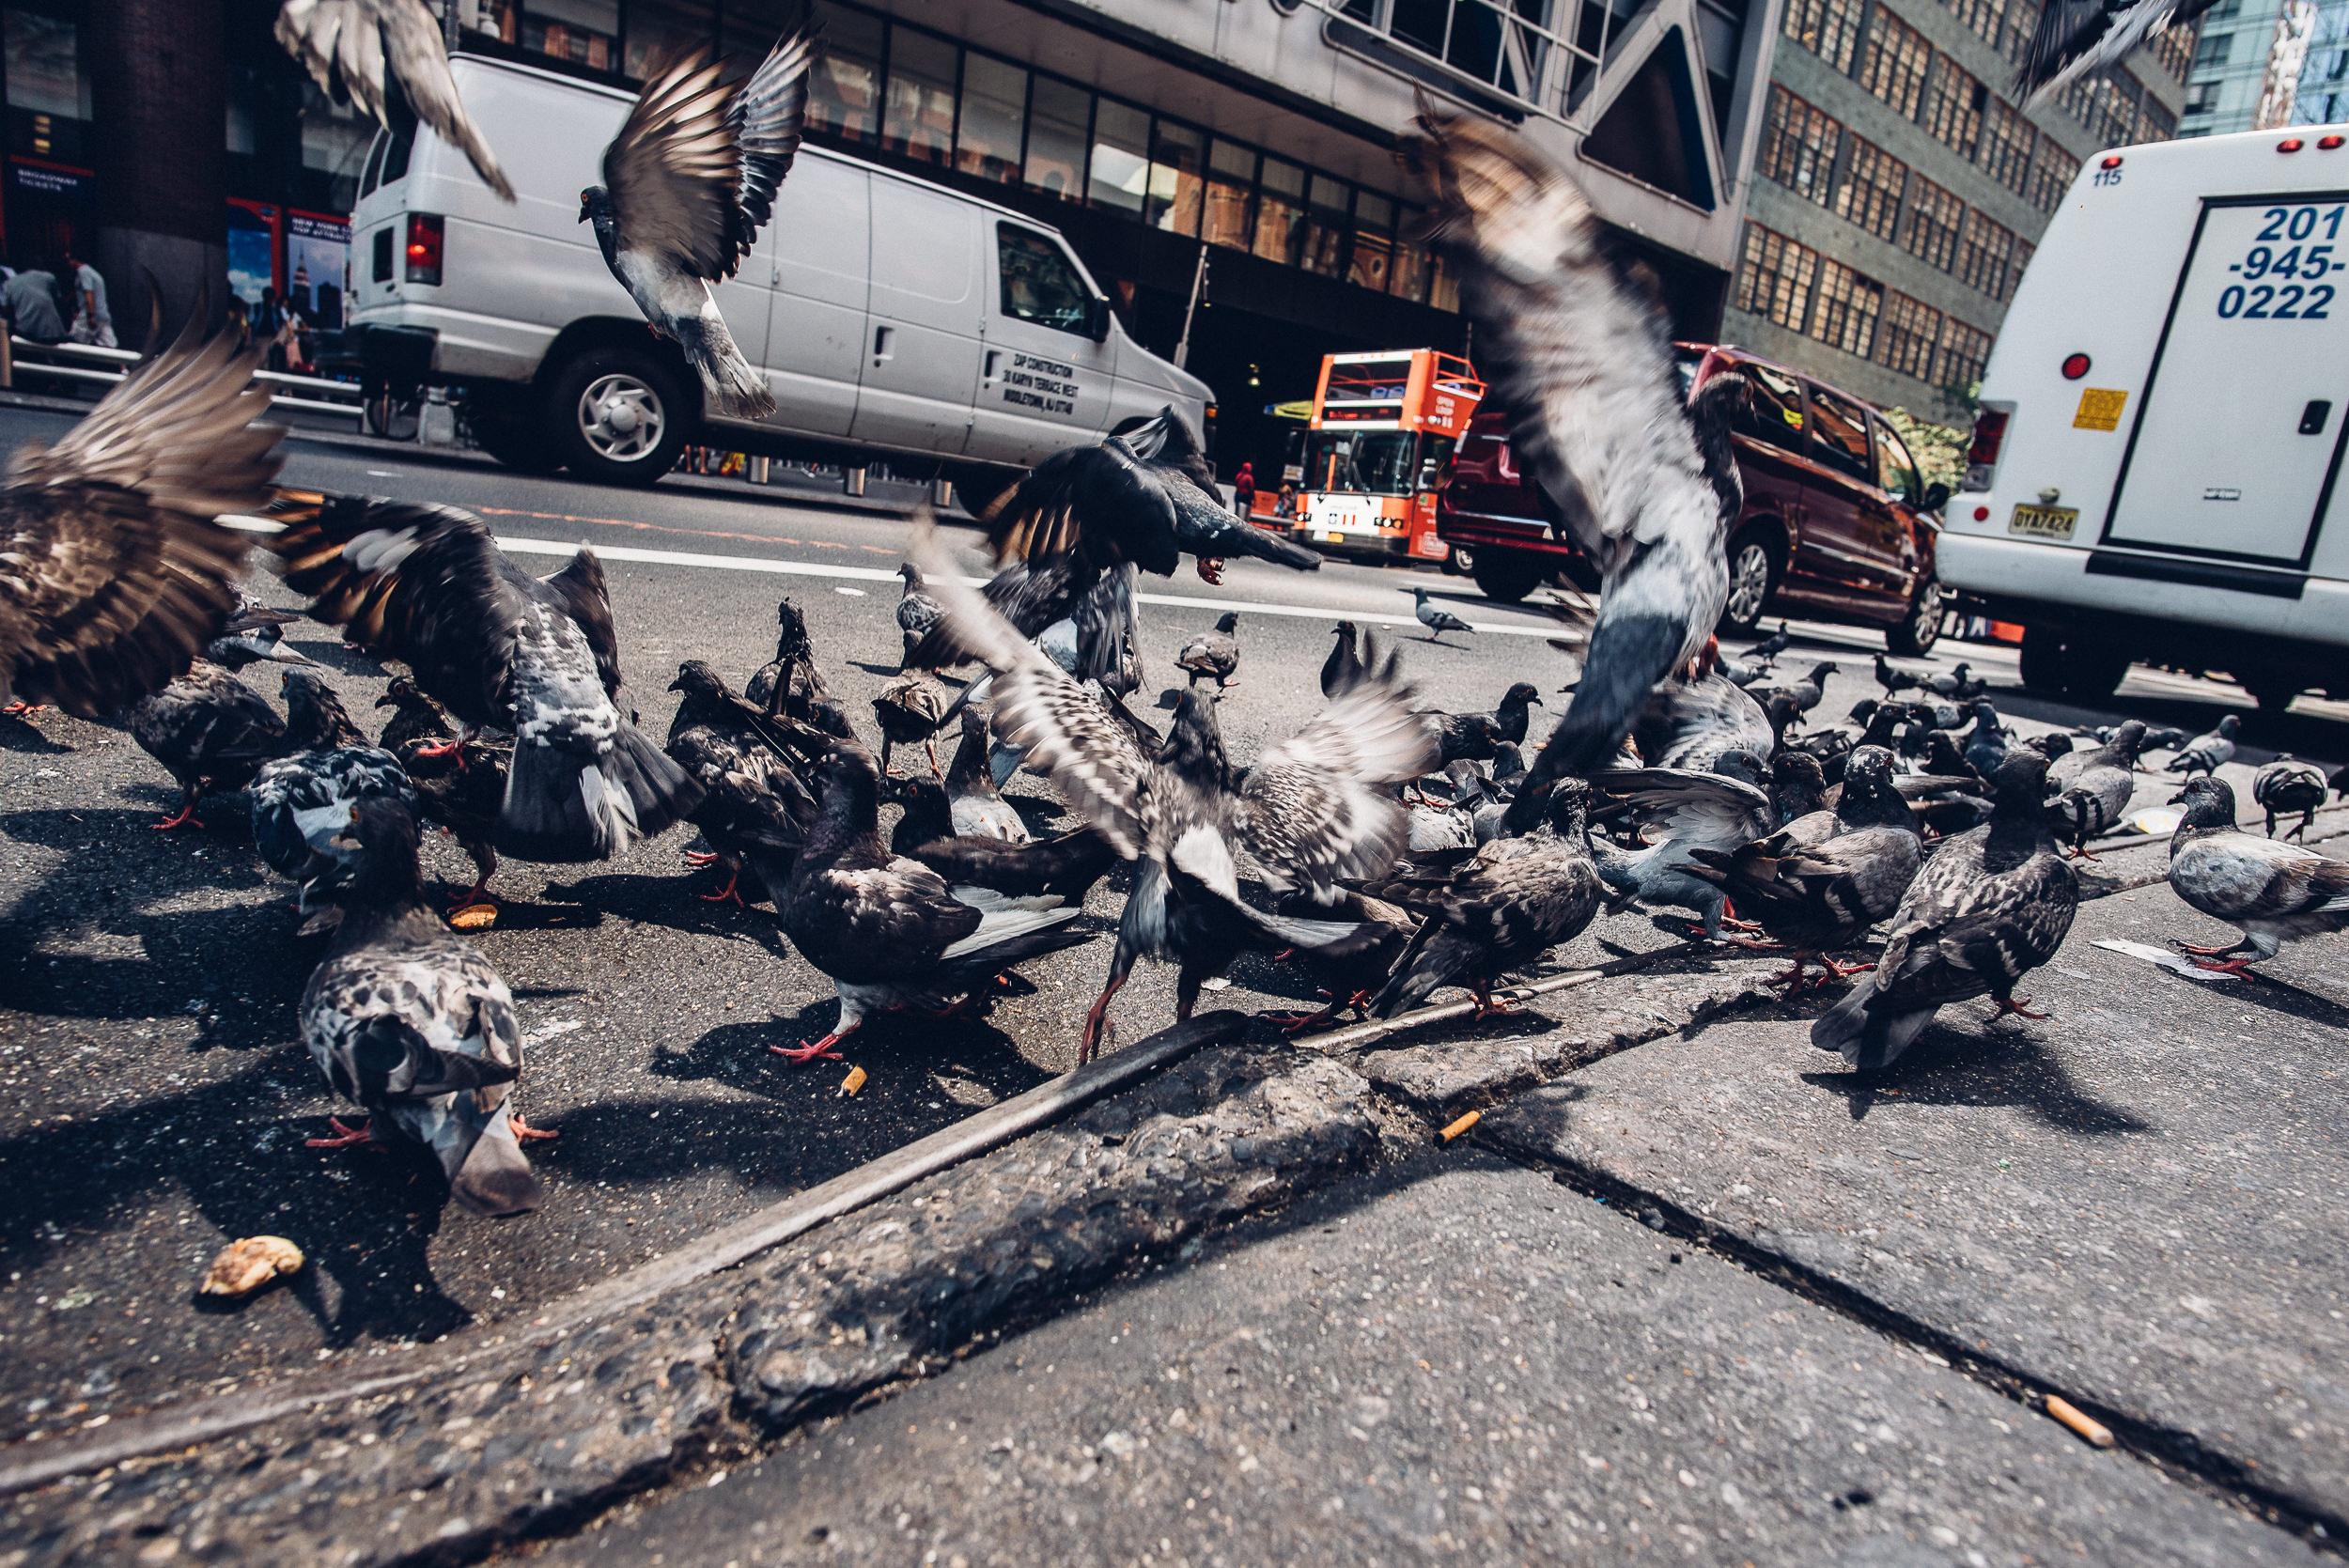 New-York-City-Travel-Photography-033.jpg